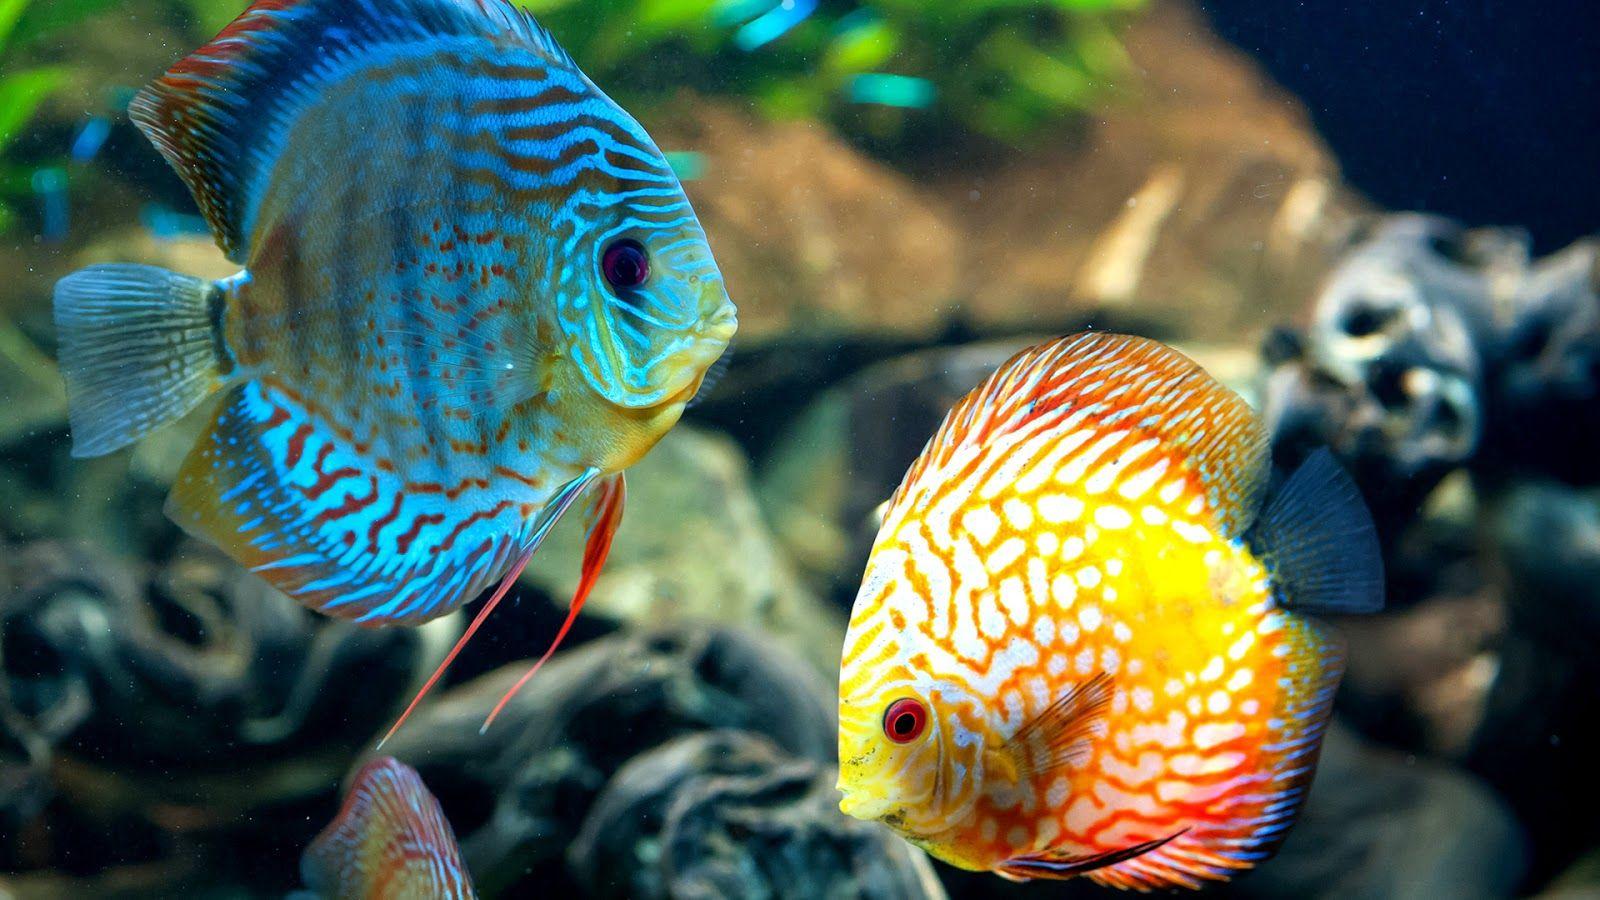 Pin By Derald Hallem On Sea Life Corral Reefs Fish Wallpaper Aquarium Fish Beautiful Fish